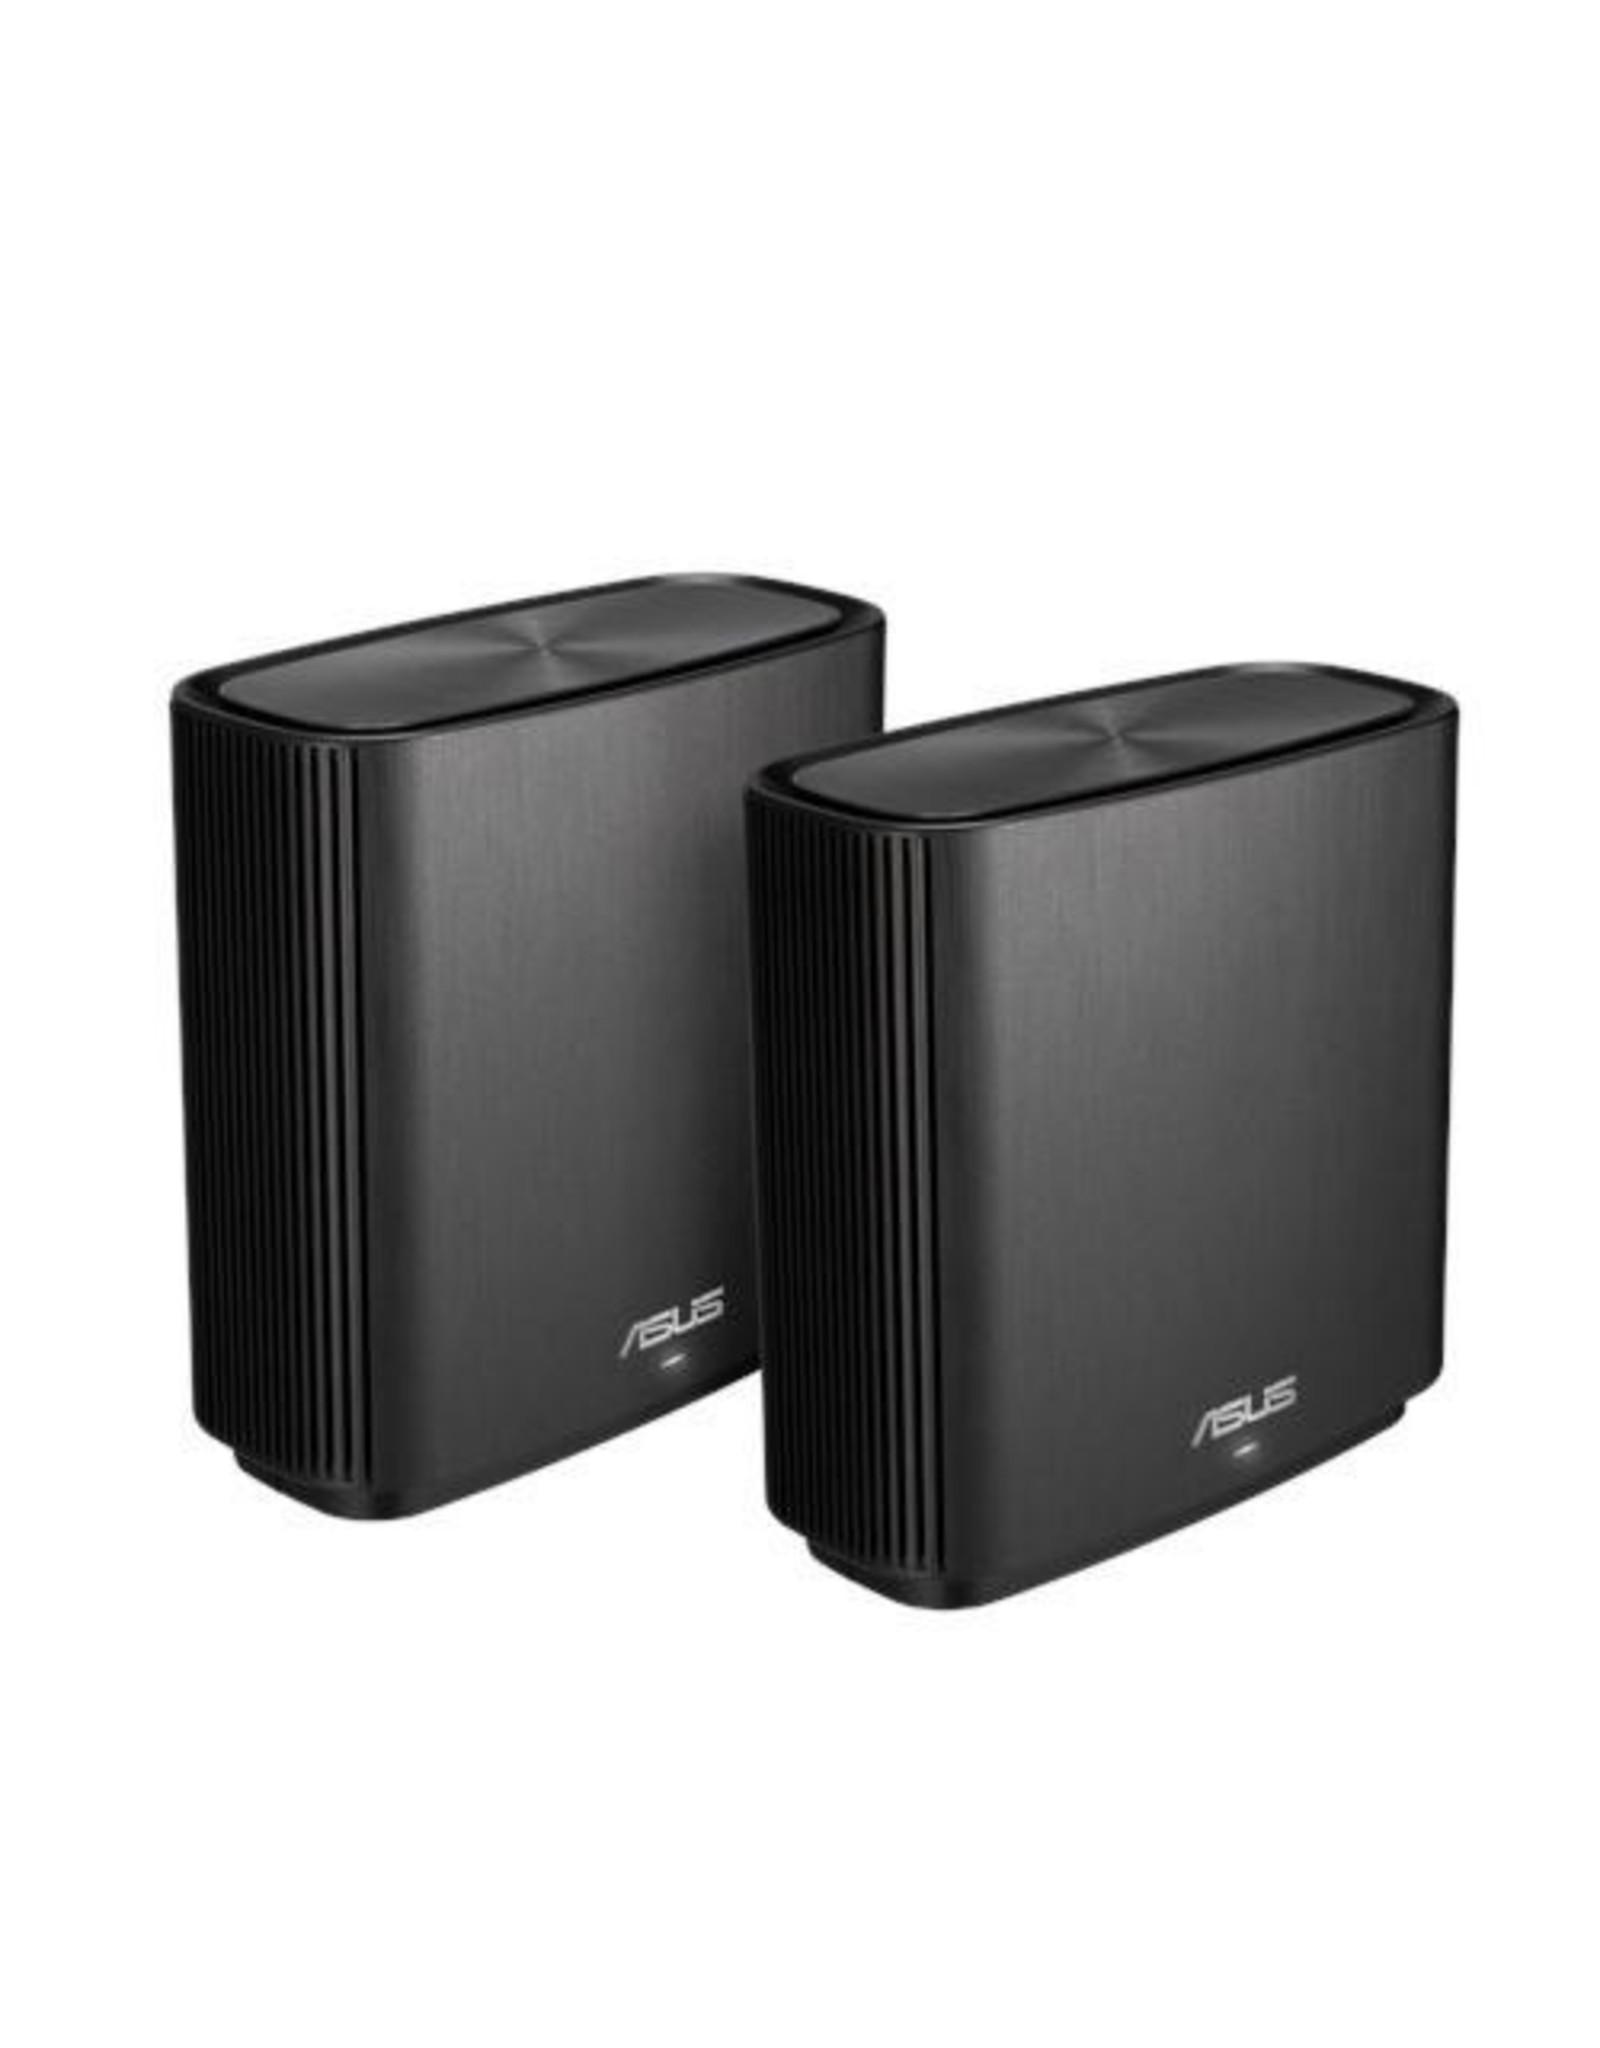 Asus ASUS ZenWiFi AC (CT8) draadloze router Gigabit Ethernet Tri-